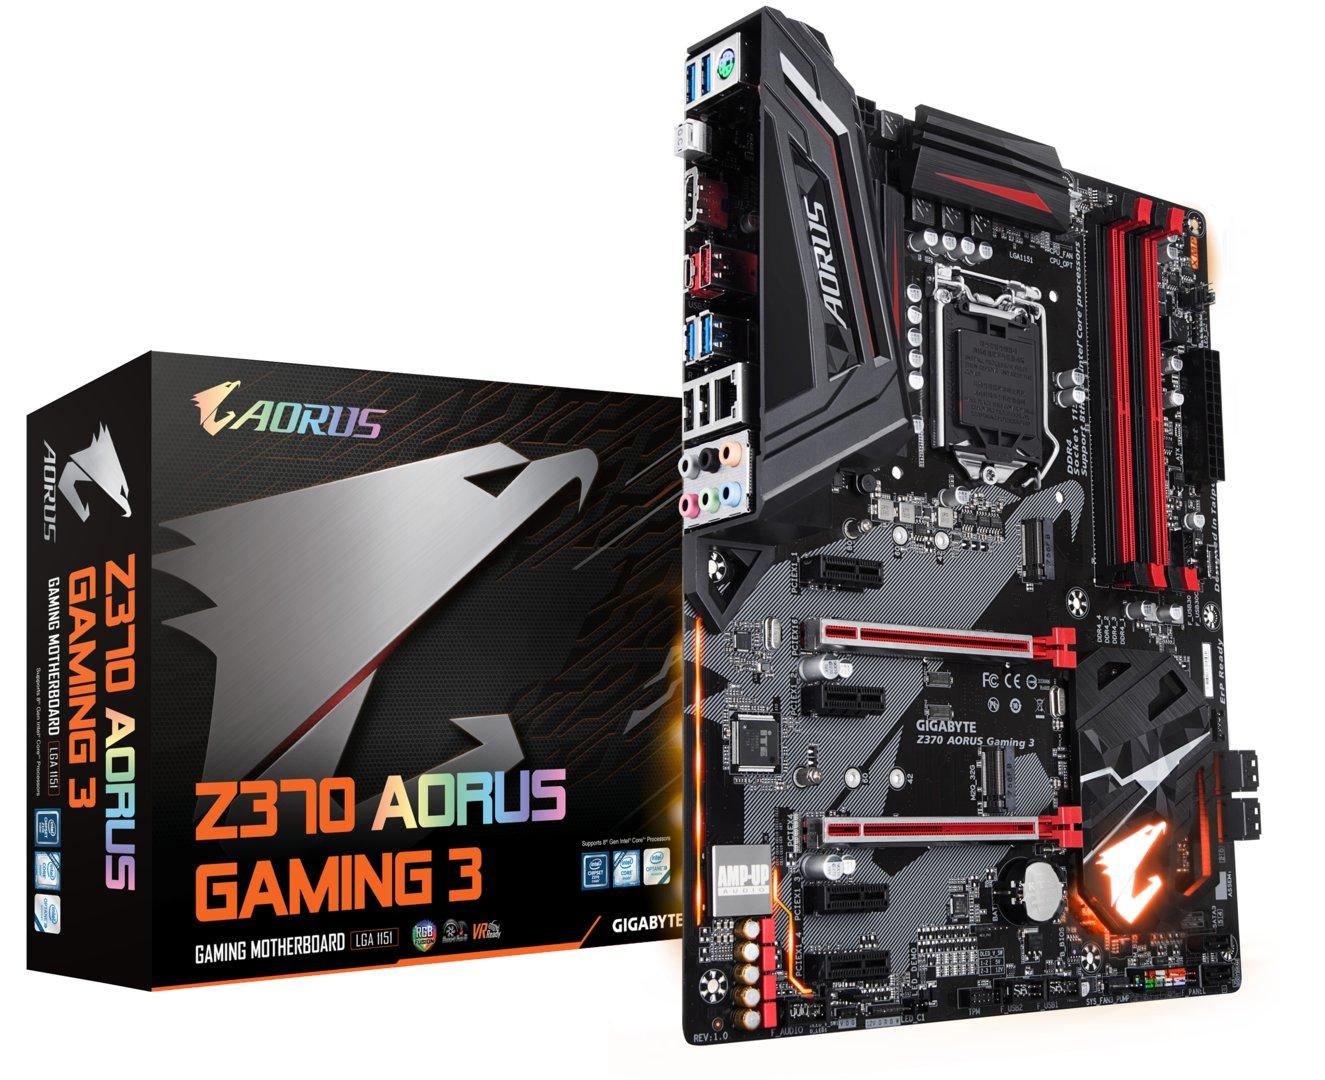 Gigabyte Aorus Z370 Gaming 3